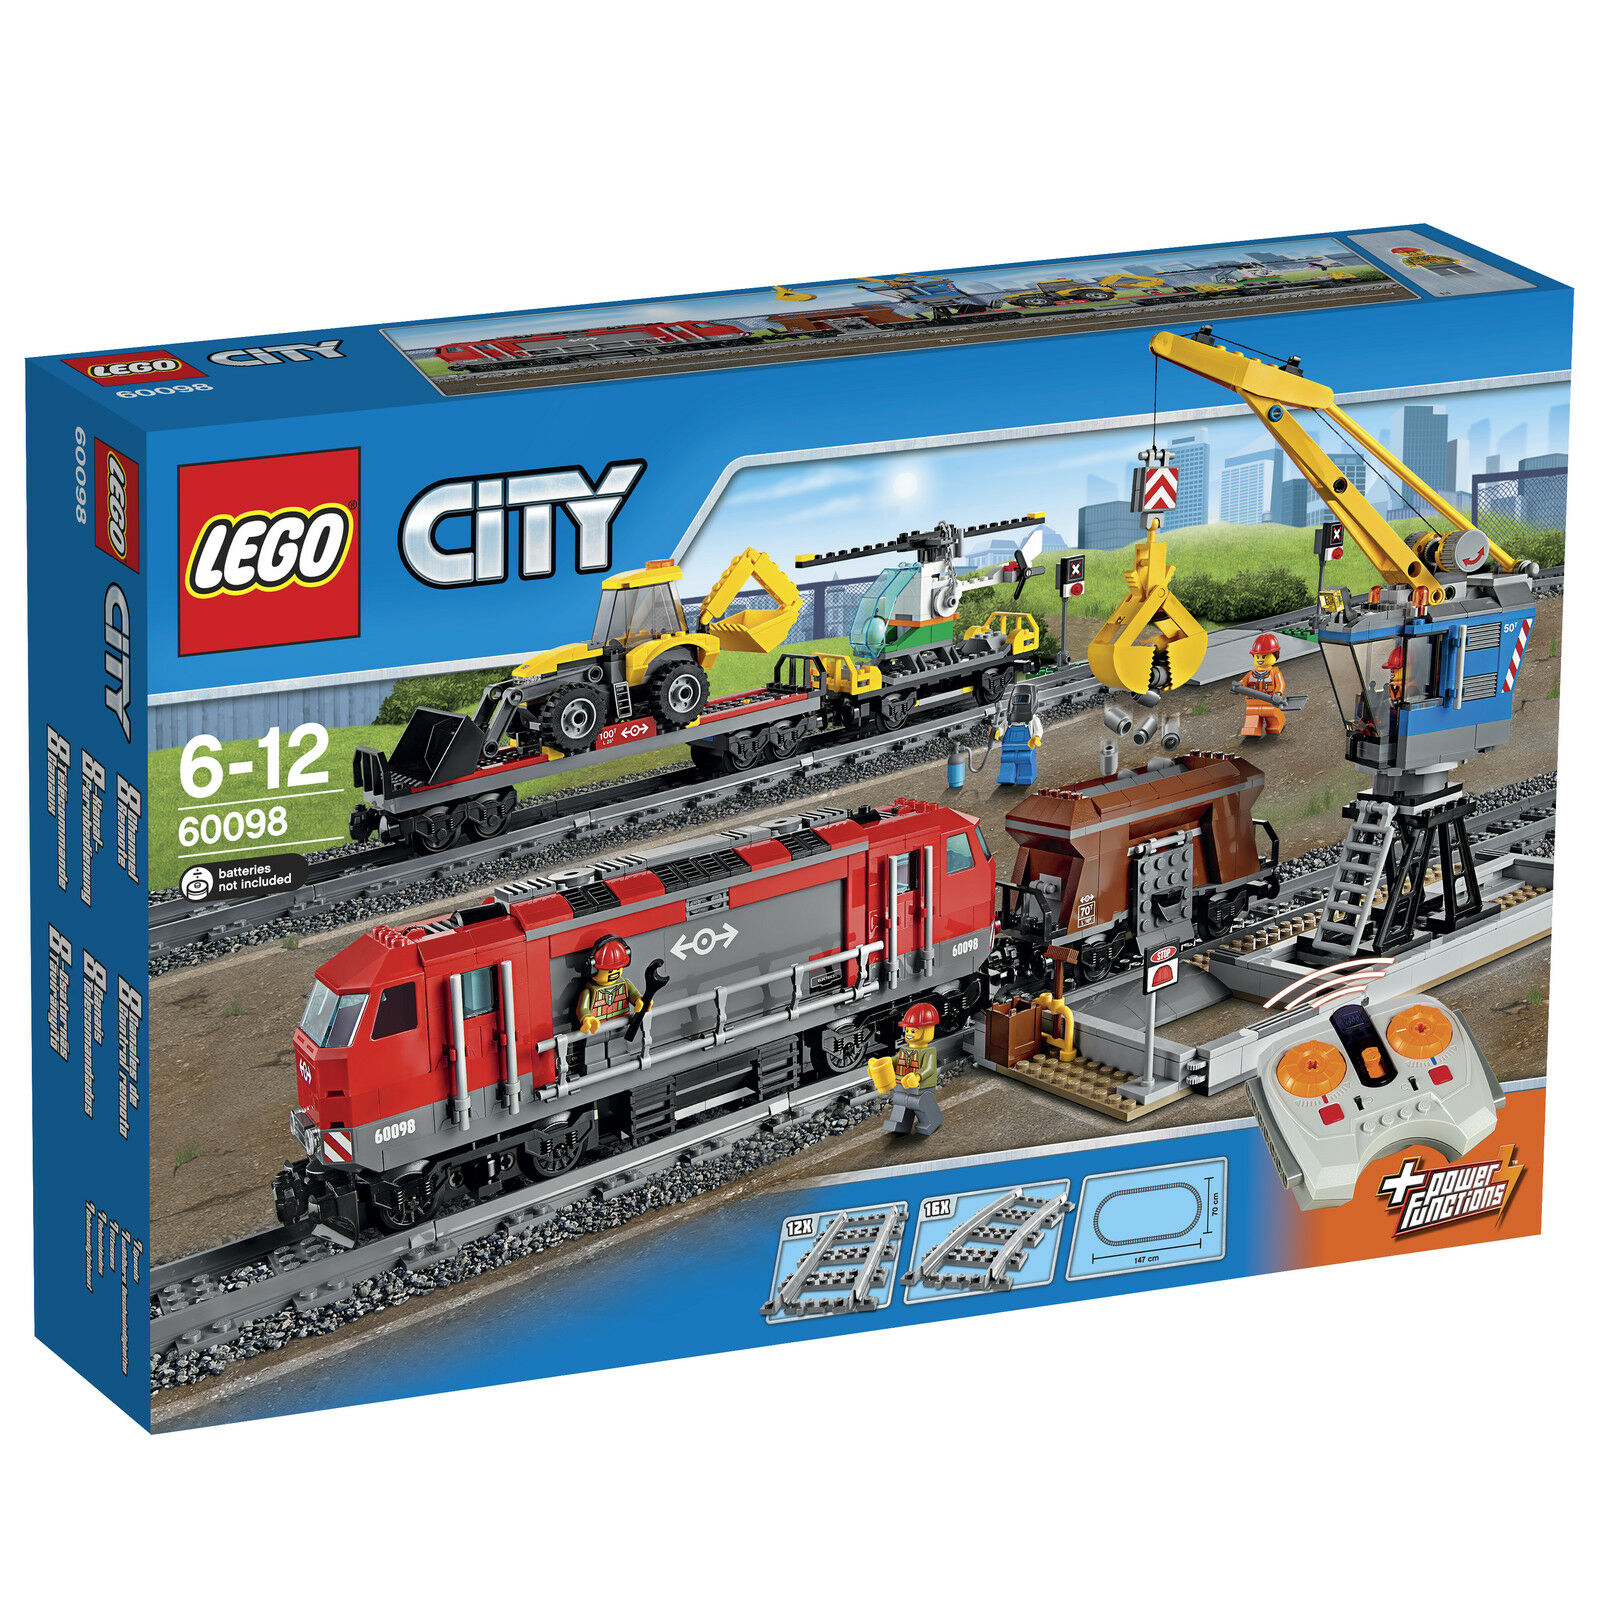 LEGO ® City 60098 lourd poids neuf emballage d'origine _ Heavy-haul train New MISB NRFB